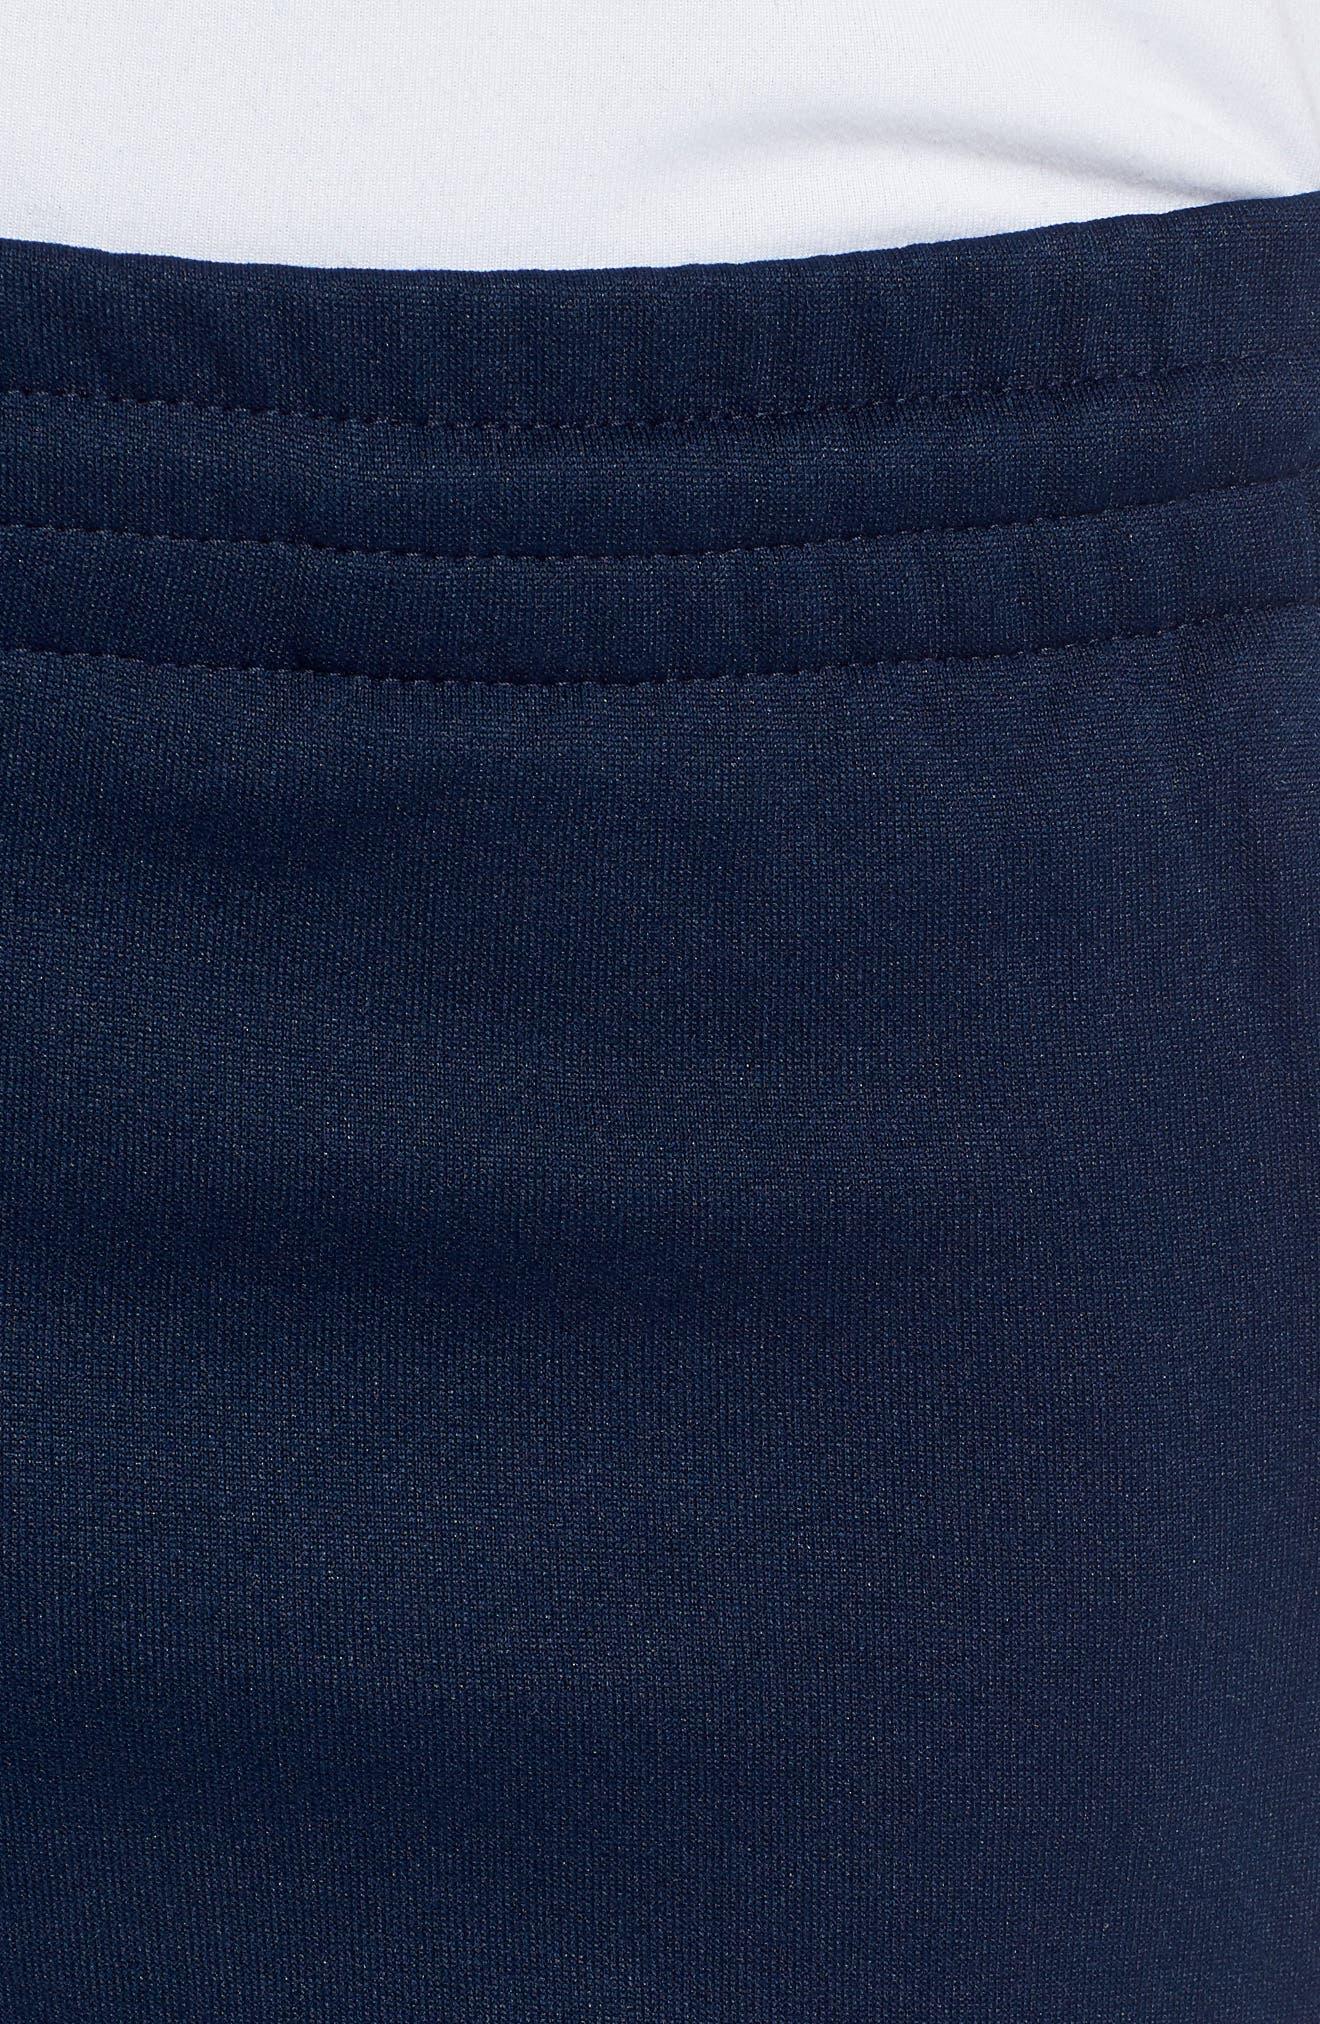 adidas Original SST Track Pants,                             Alternate thumbnail 3, color,                             COLLEGIATE NAVY